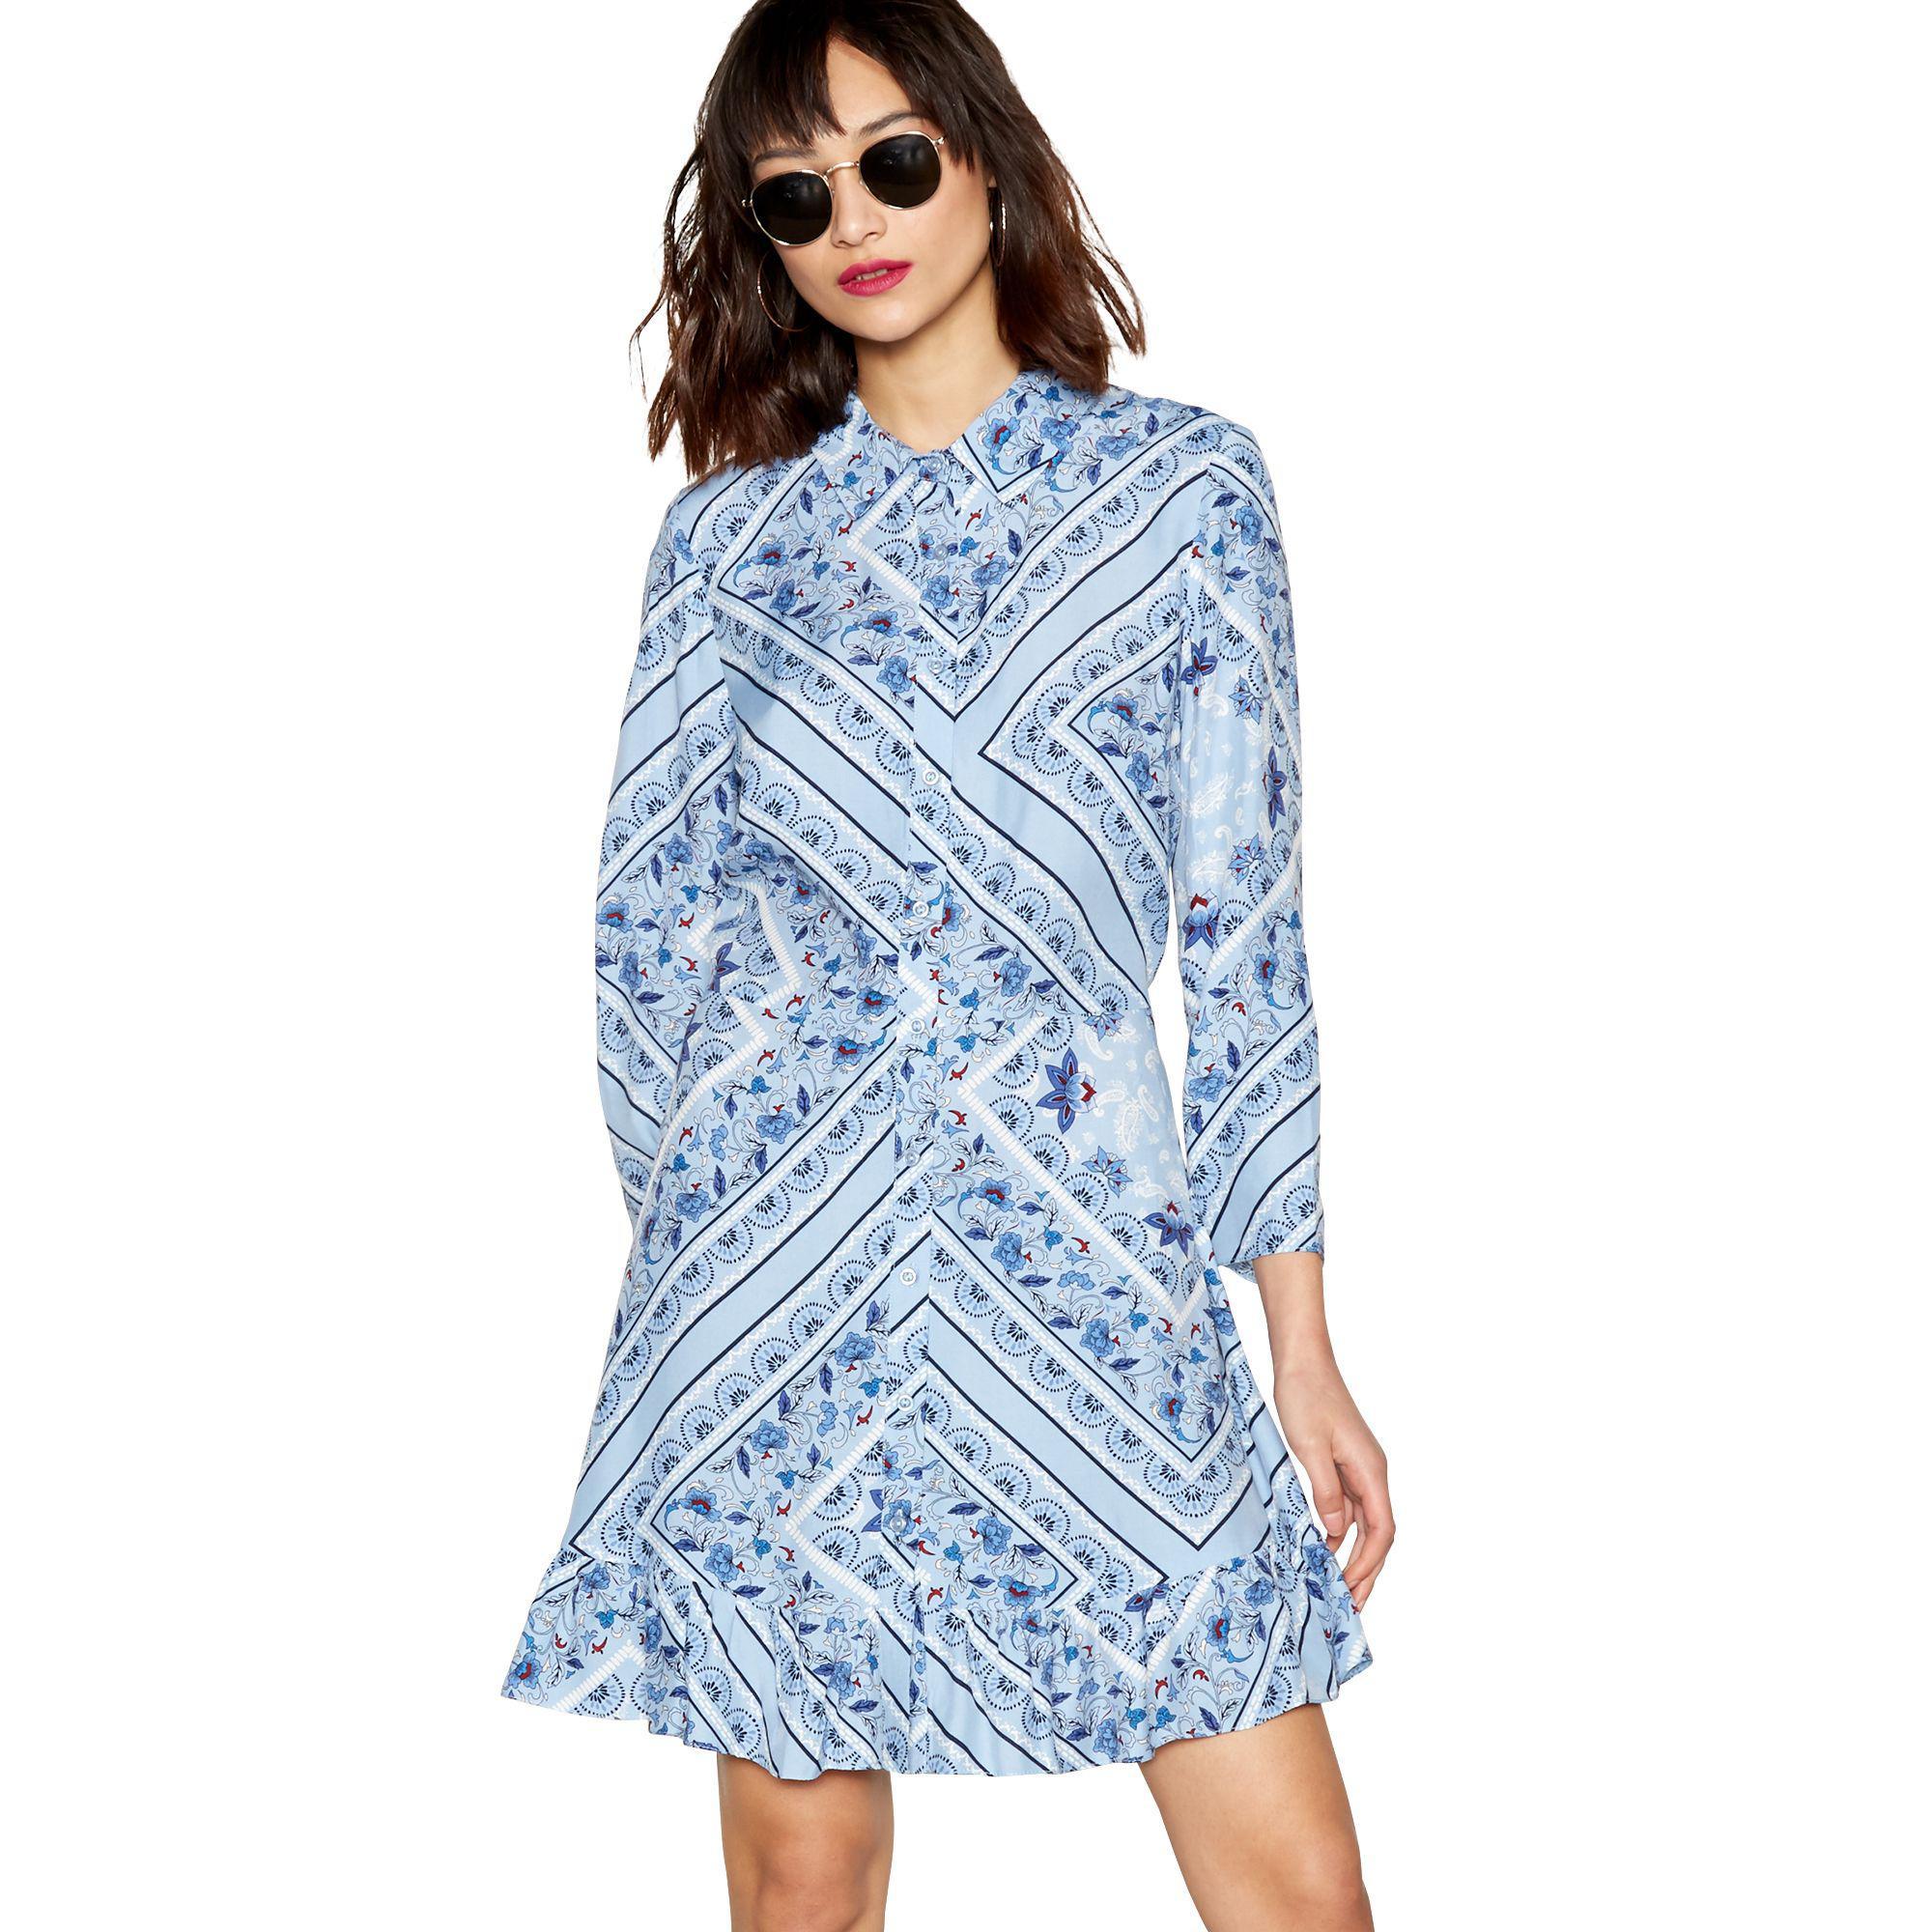 93a2bdad210c69 Red Herring Blue Scarf Print Long Sleeve Ruffle Shirt Dress in Blue ...